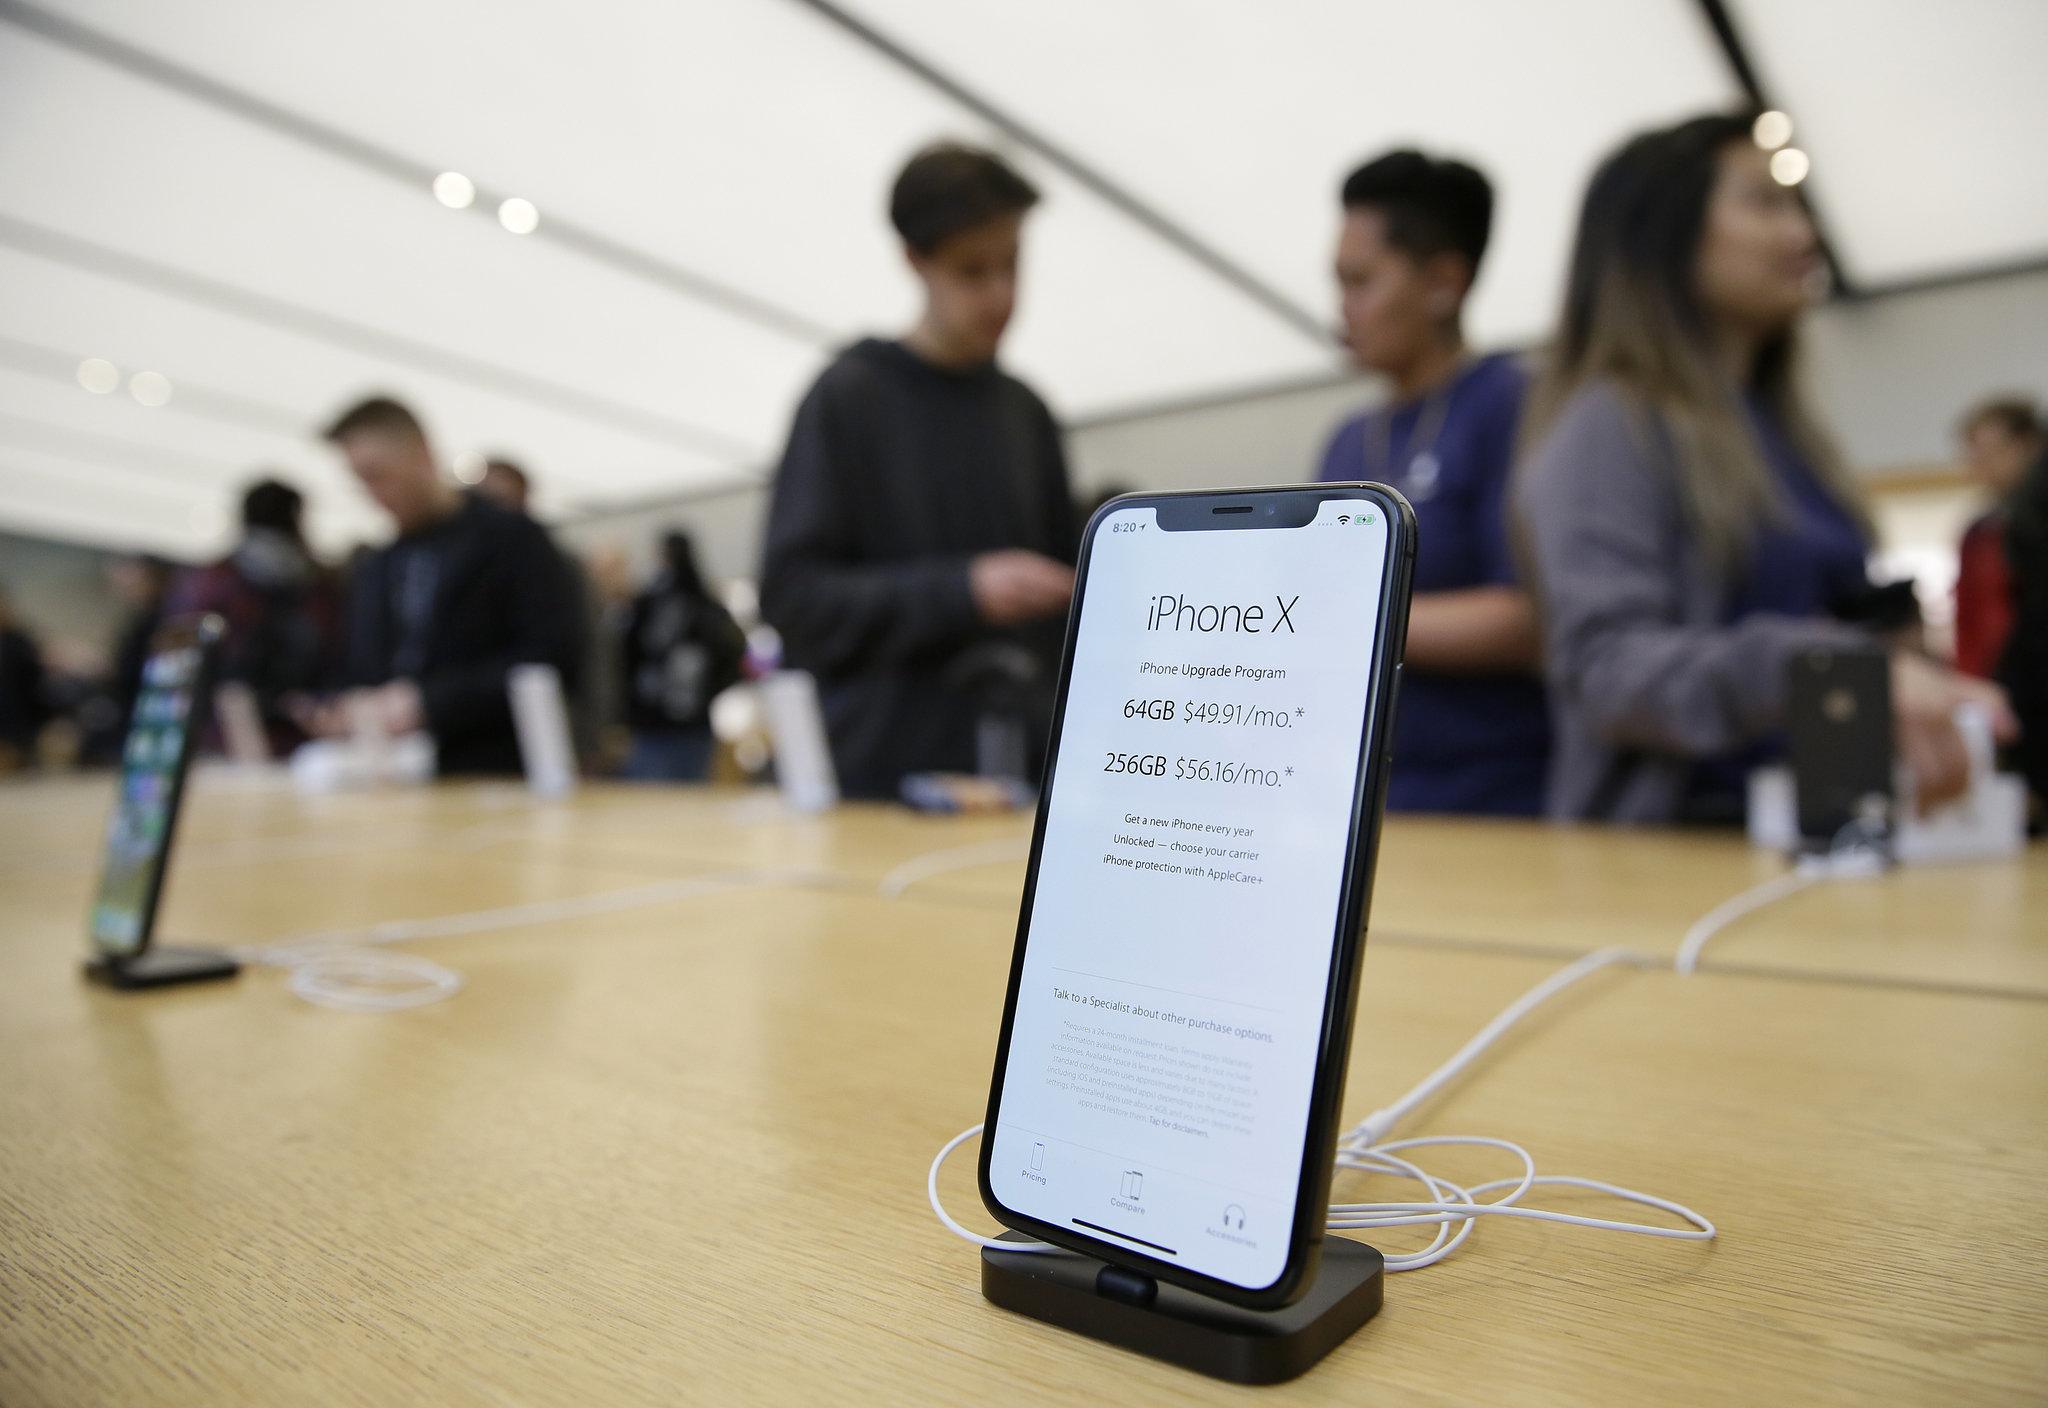 Apple Store Staten Island Mall Phone